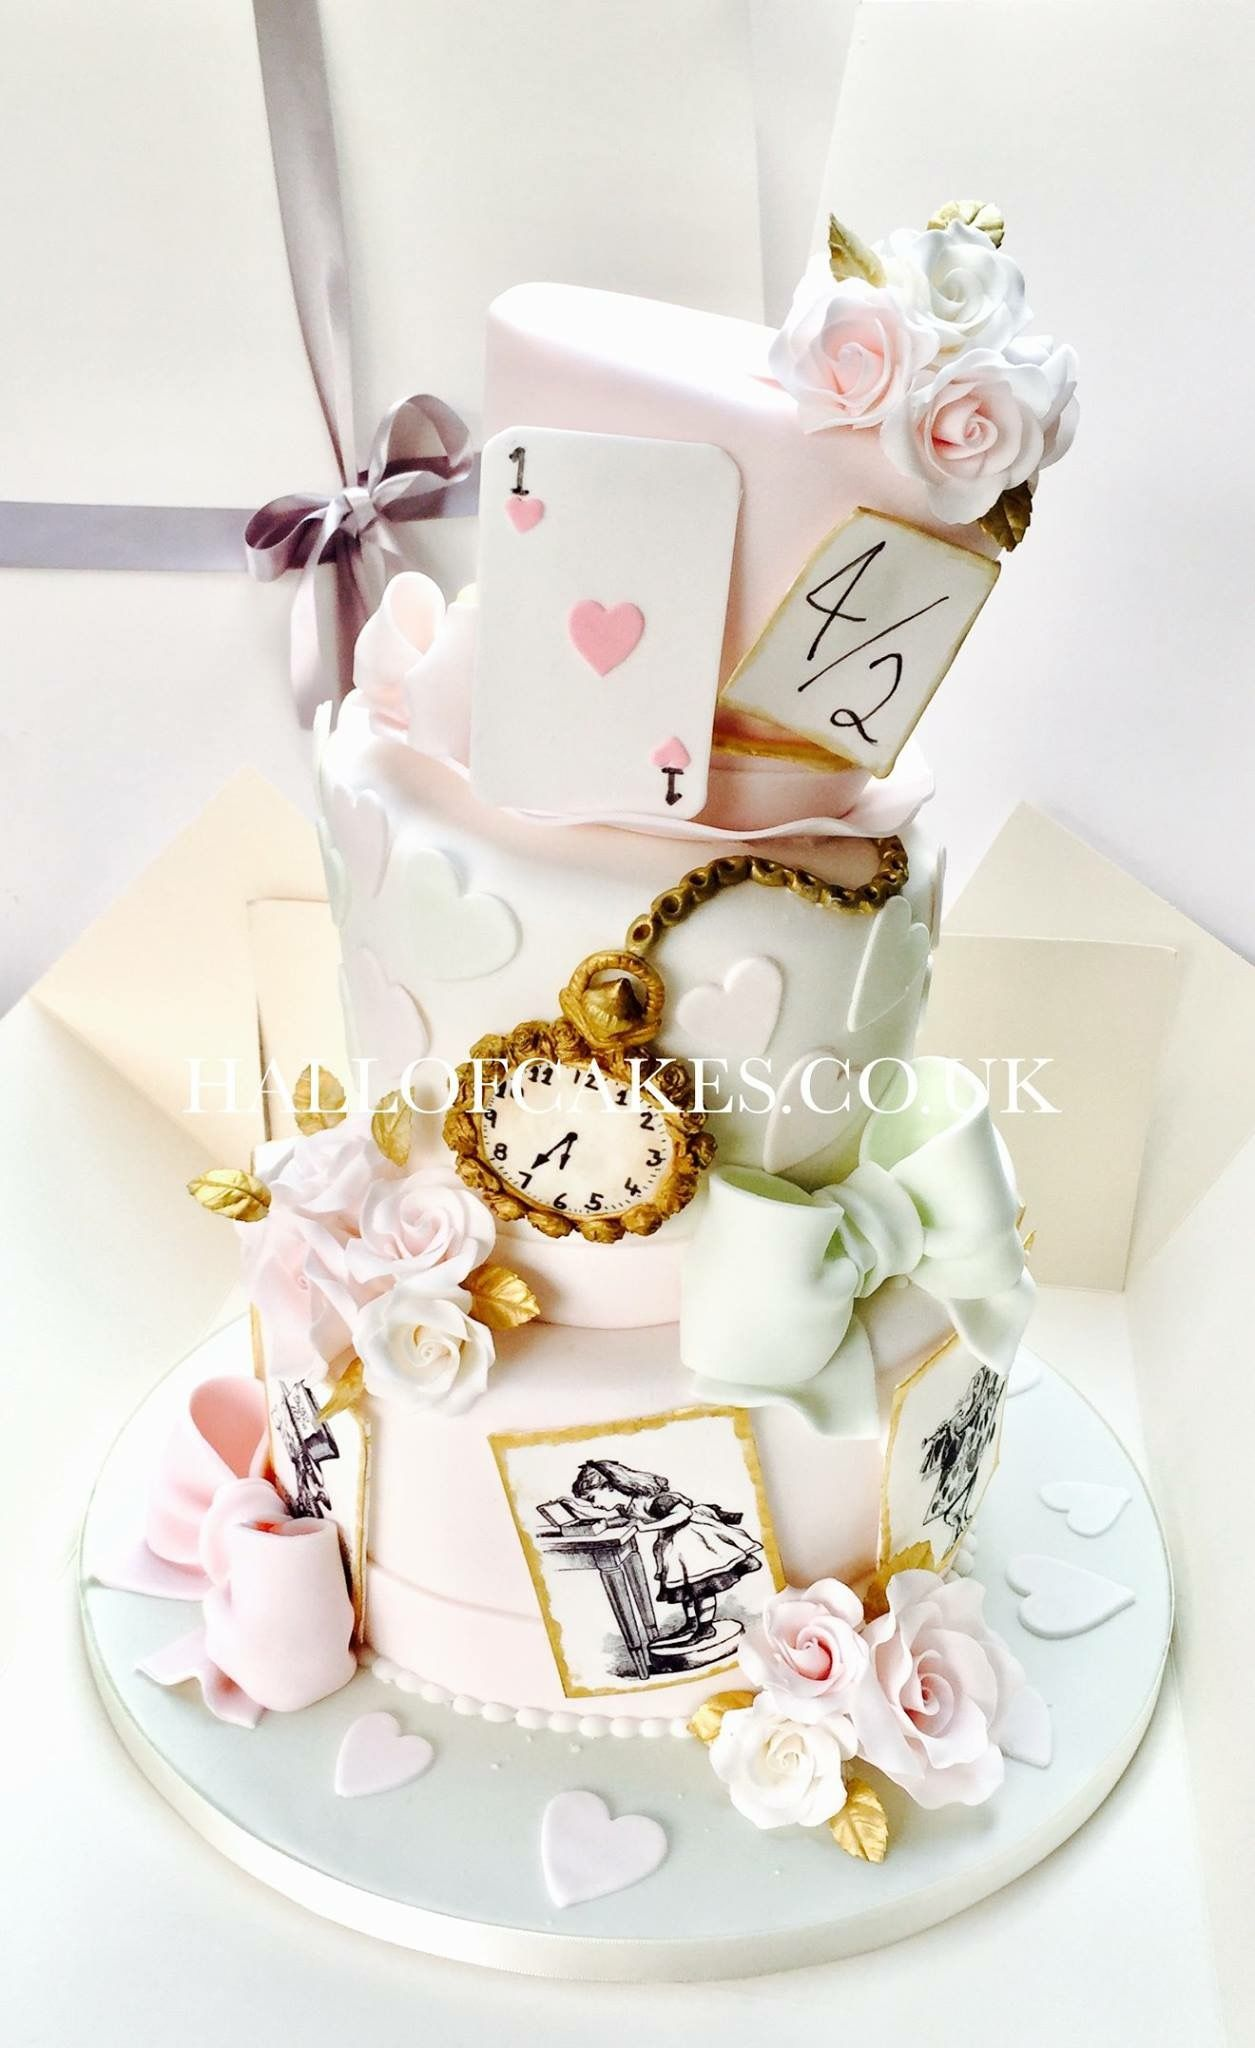 Pin by Pat Korn on Wonderland Cakes | Pinterest | Alice, Tea parties ...